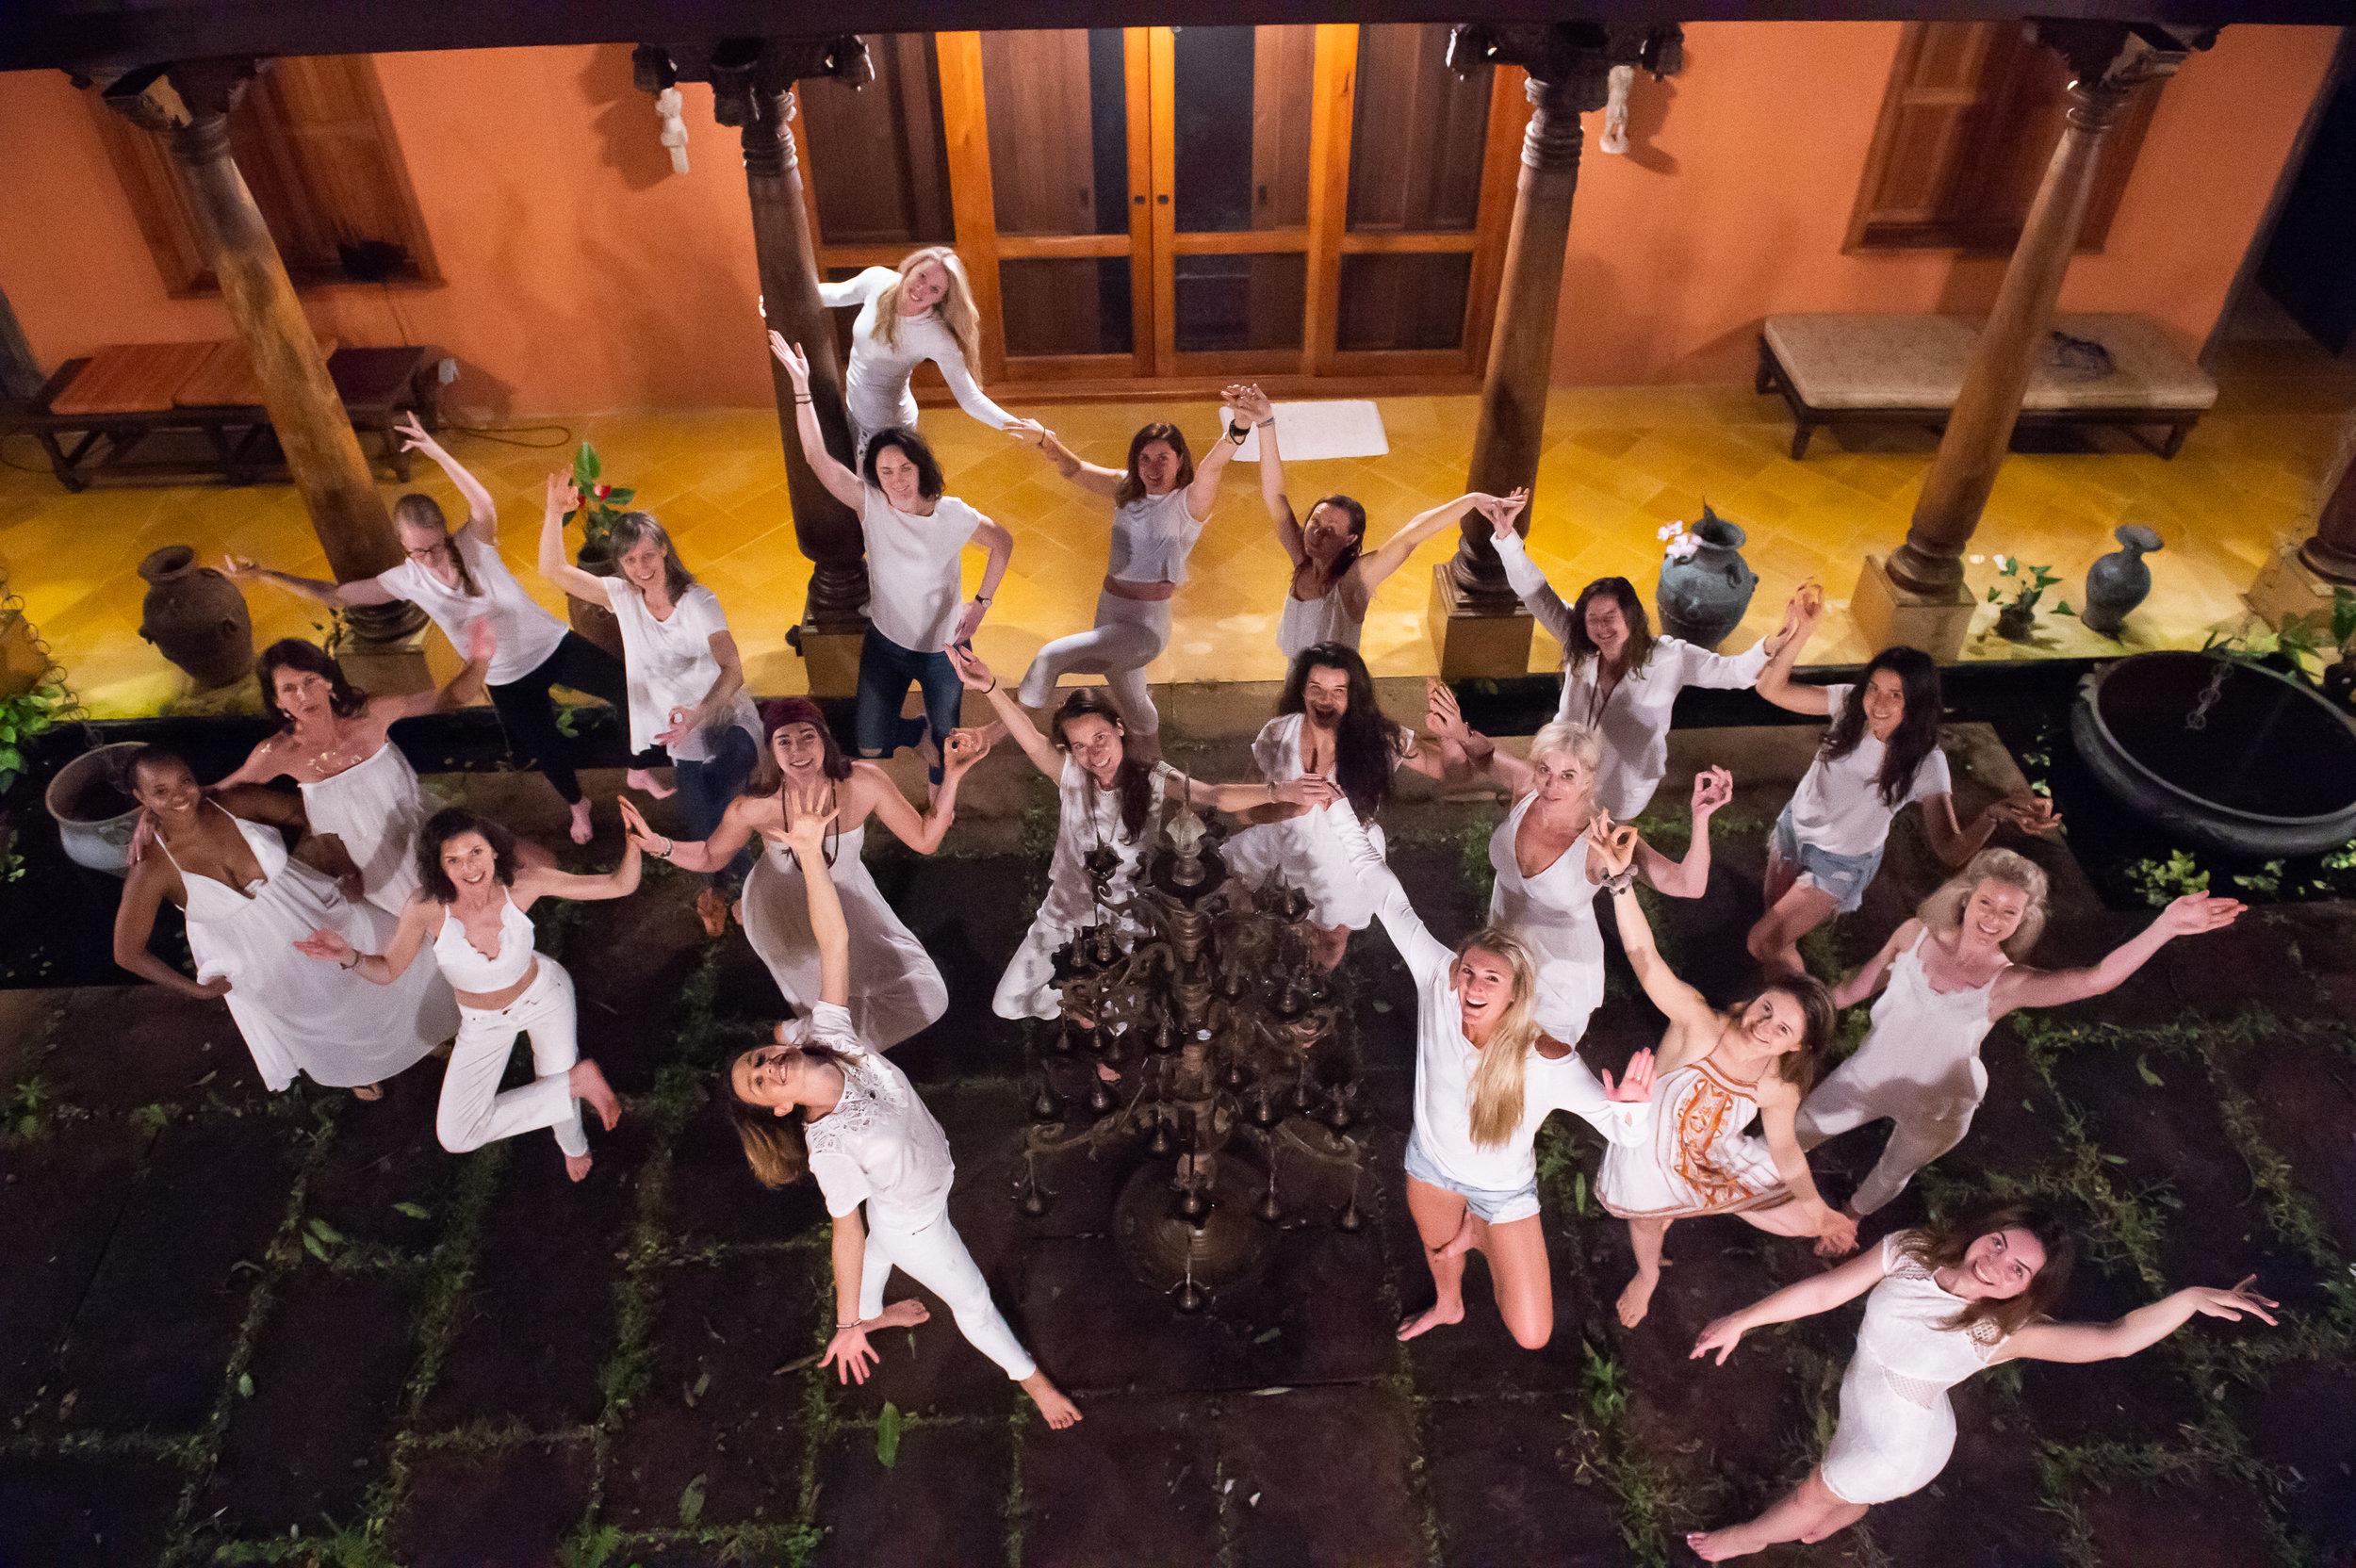 Chloe-Jackman-Photography-kauai-yoga-retreat-2019-3371.jpg